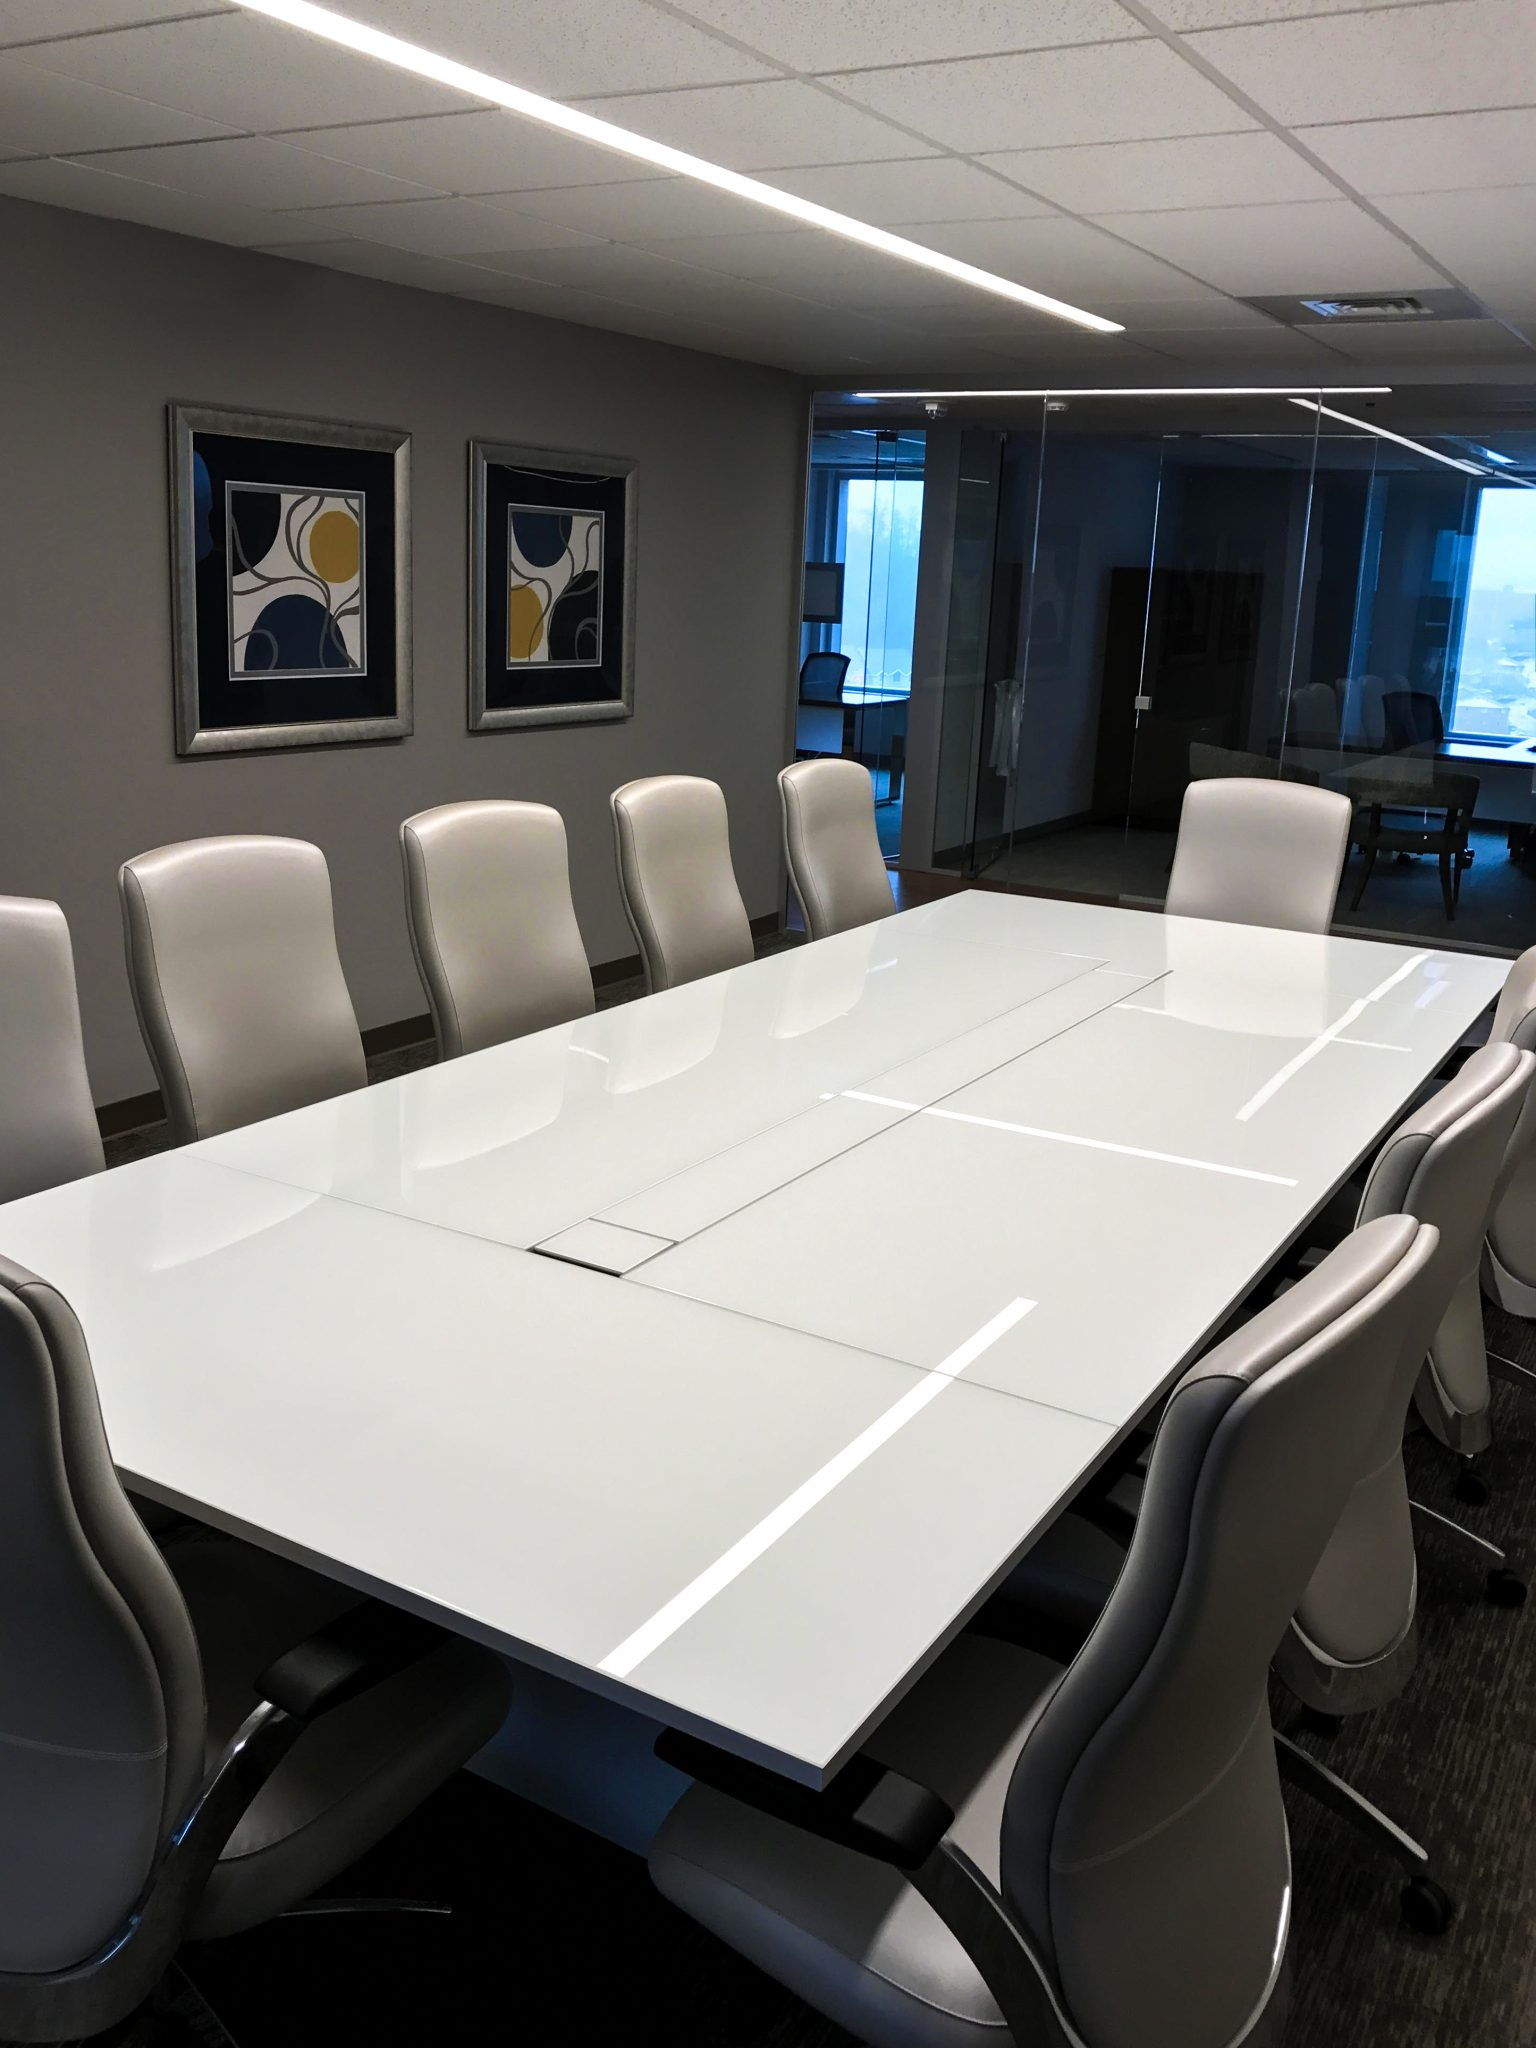 omega commercial interiors named select dealer of kimball office omega commercial interiors